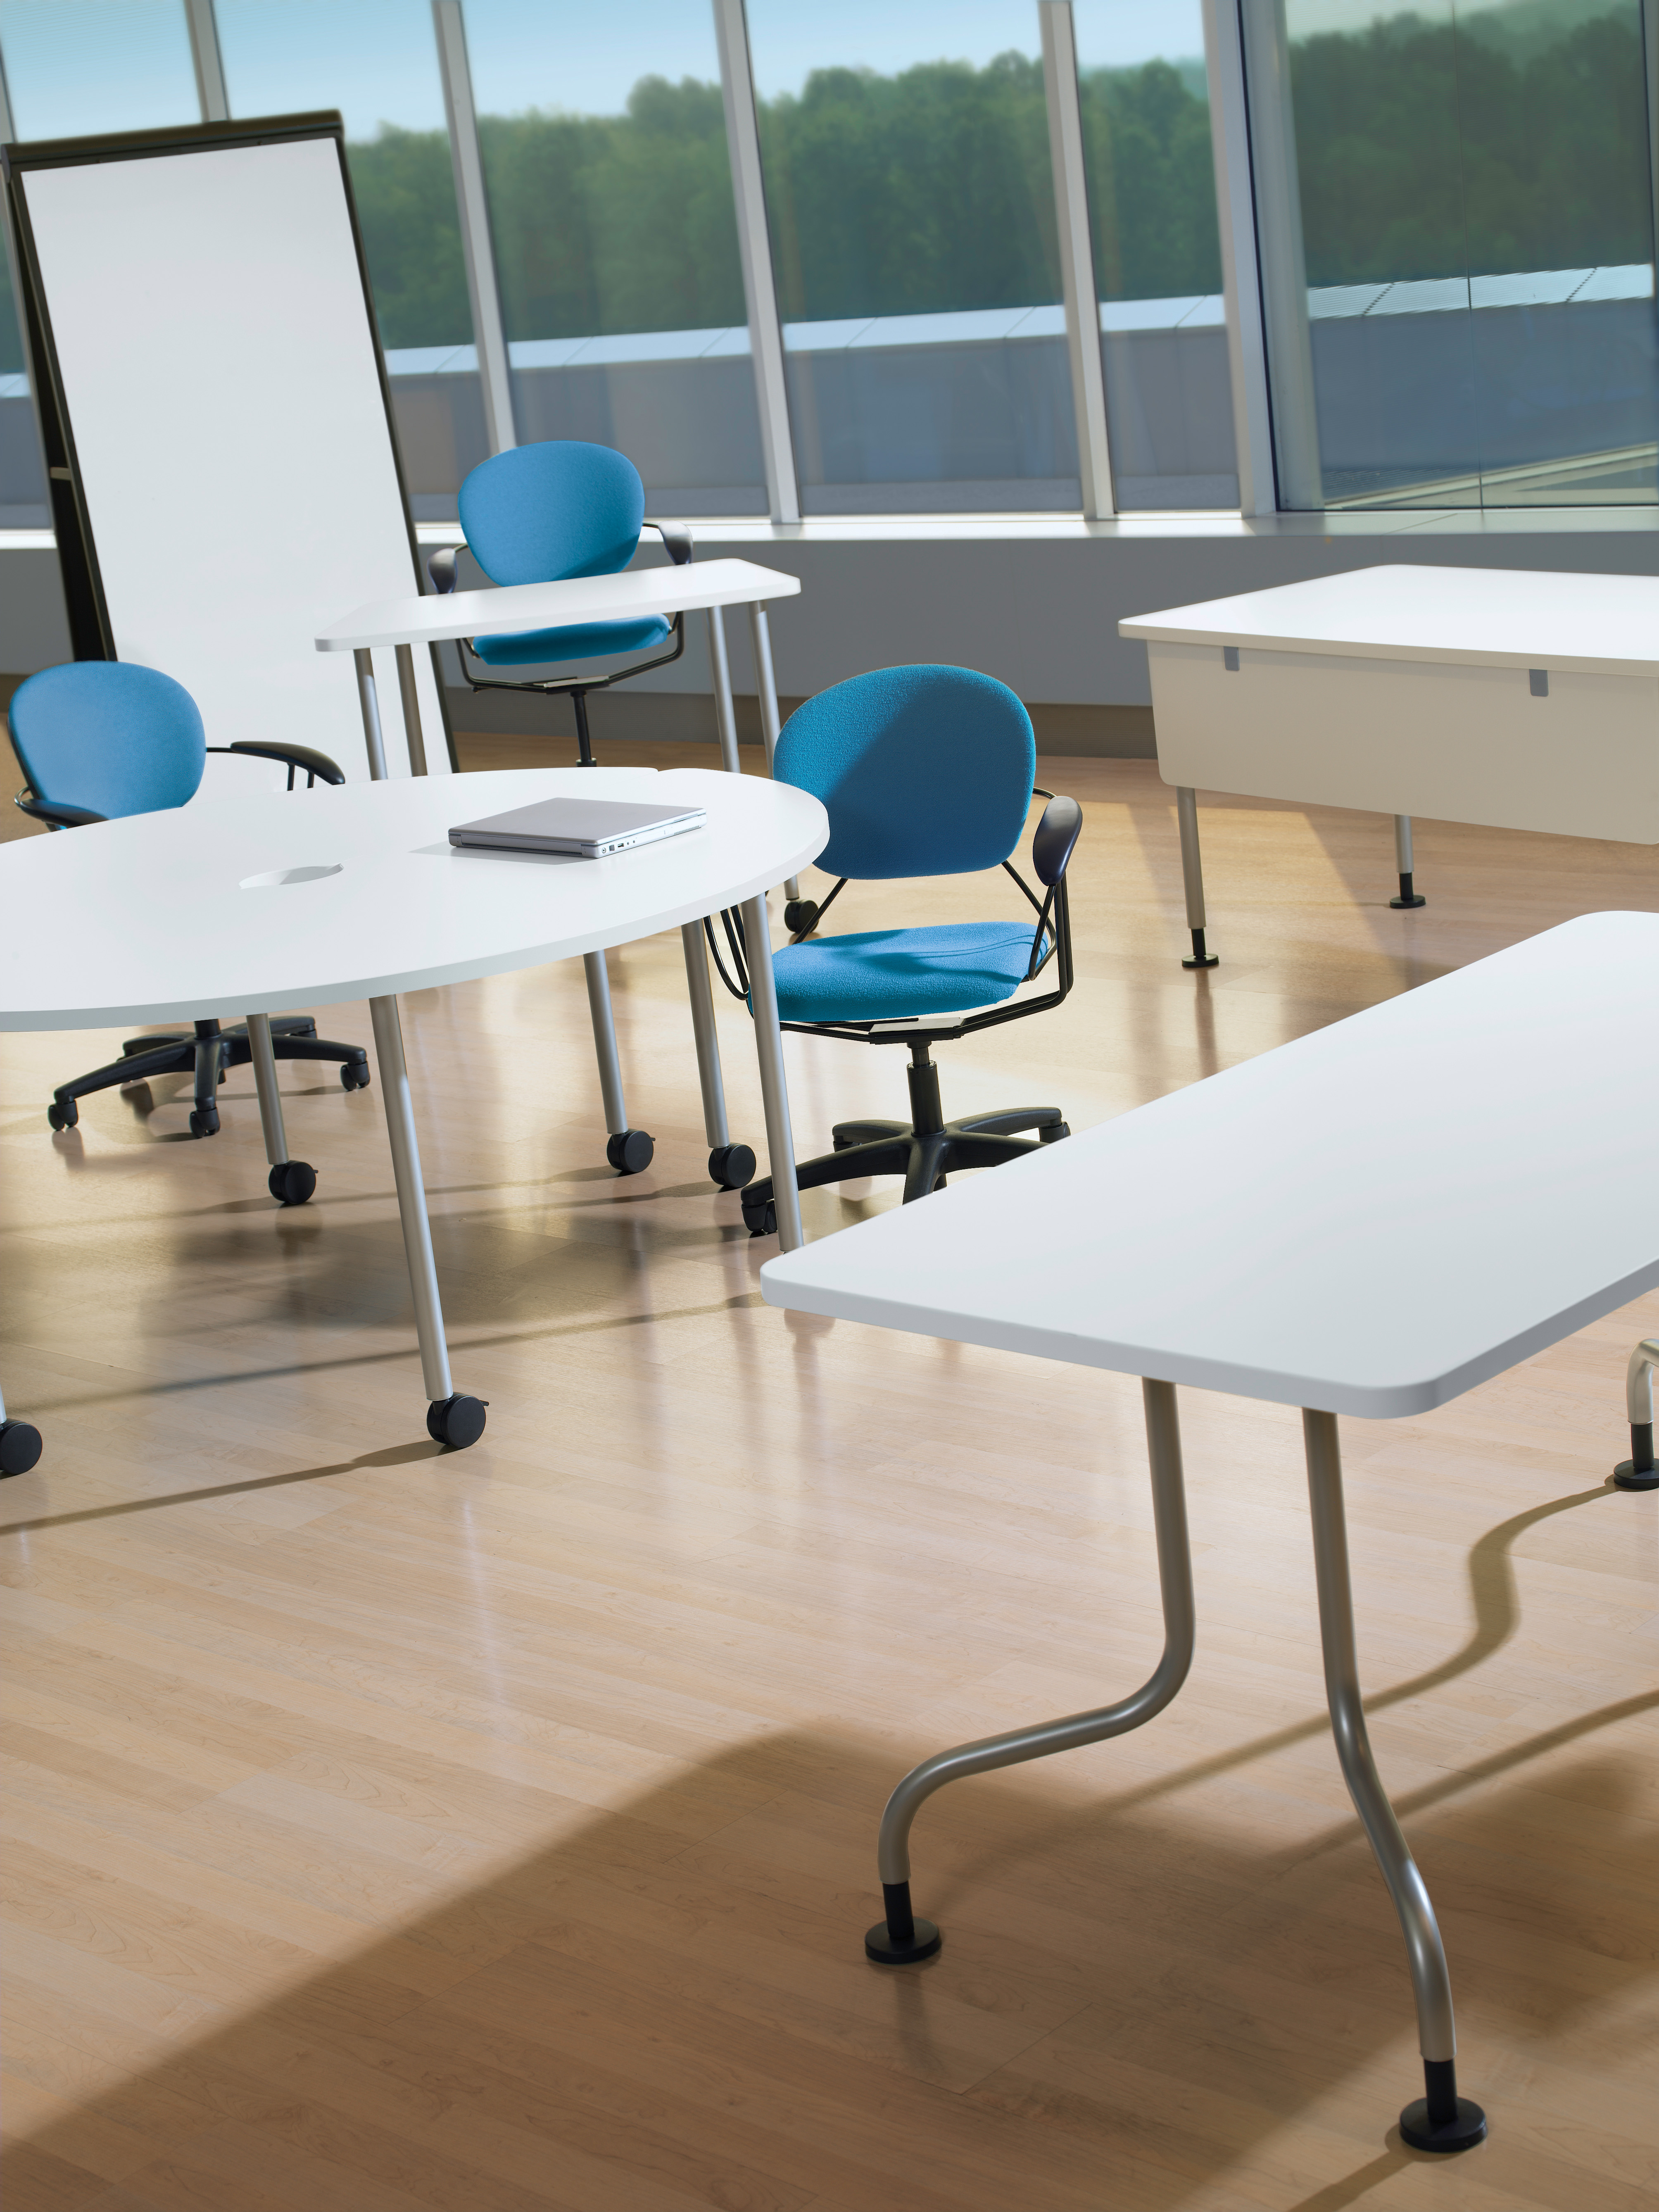 Groupwork Environment